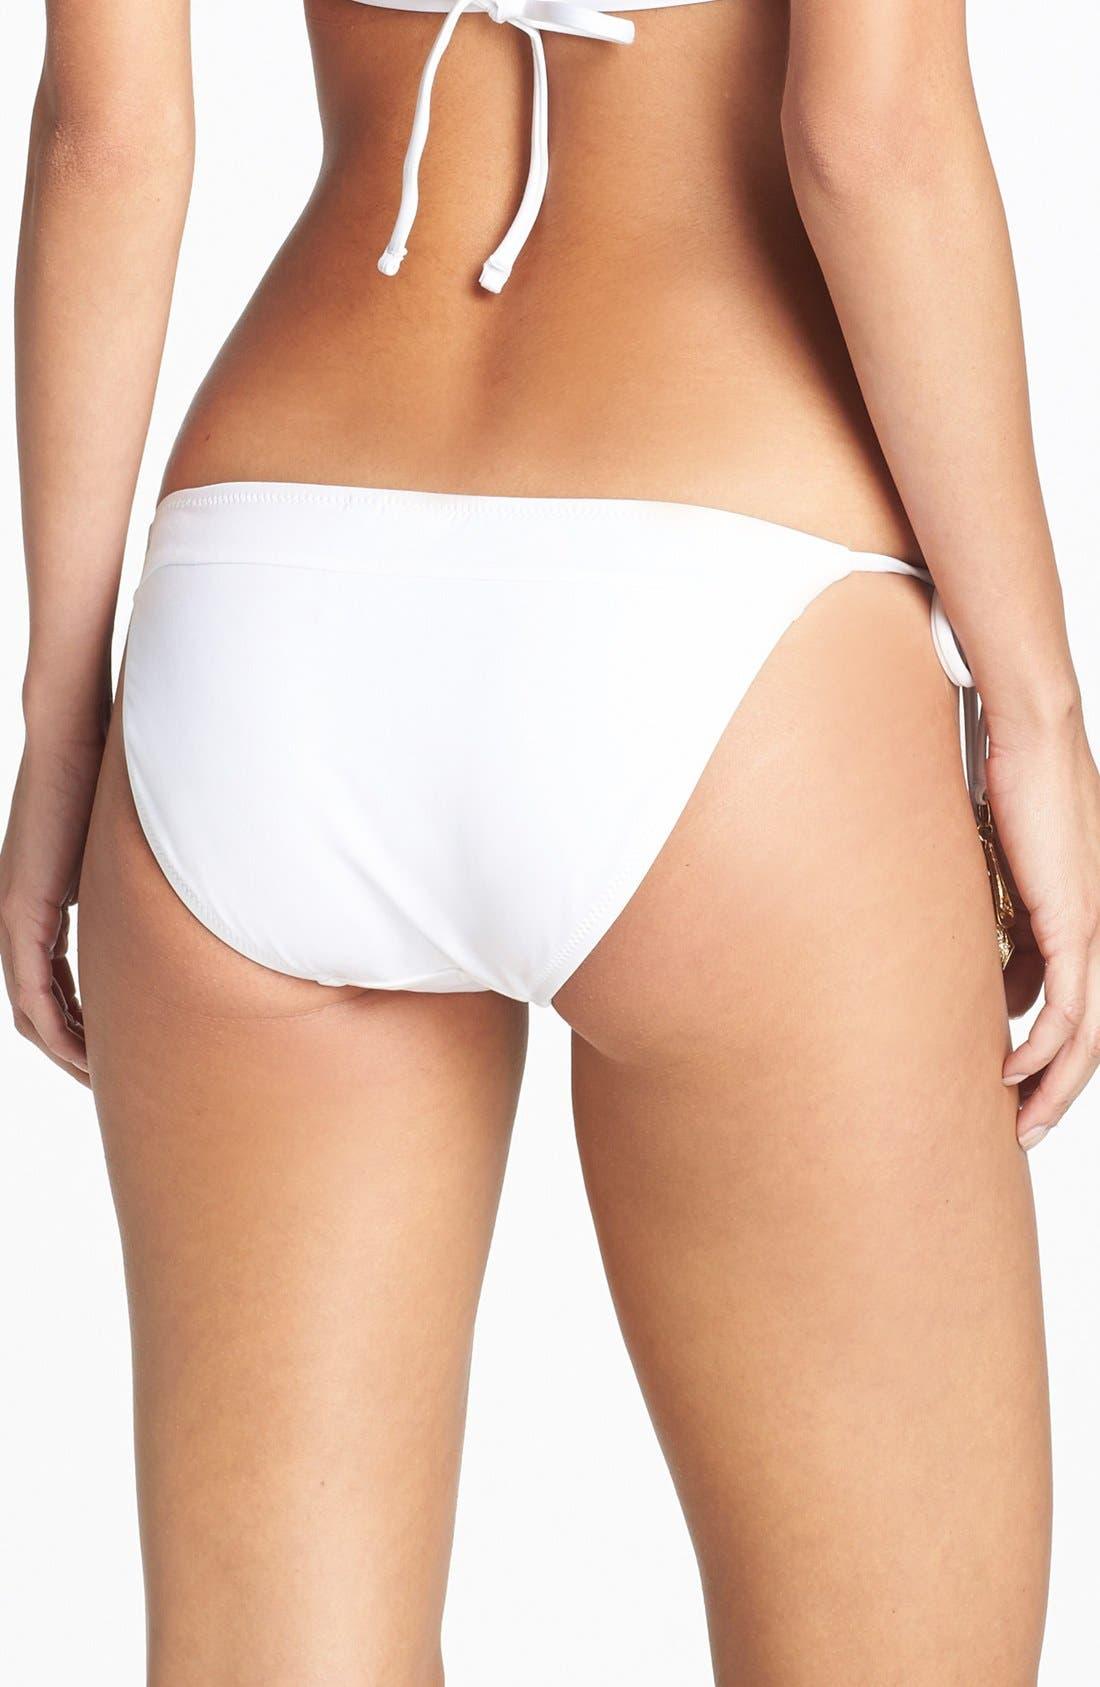 Alternate Image 2  - Trina Turk 'Madagascar' Bikini Bottoms